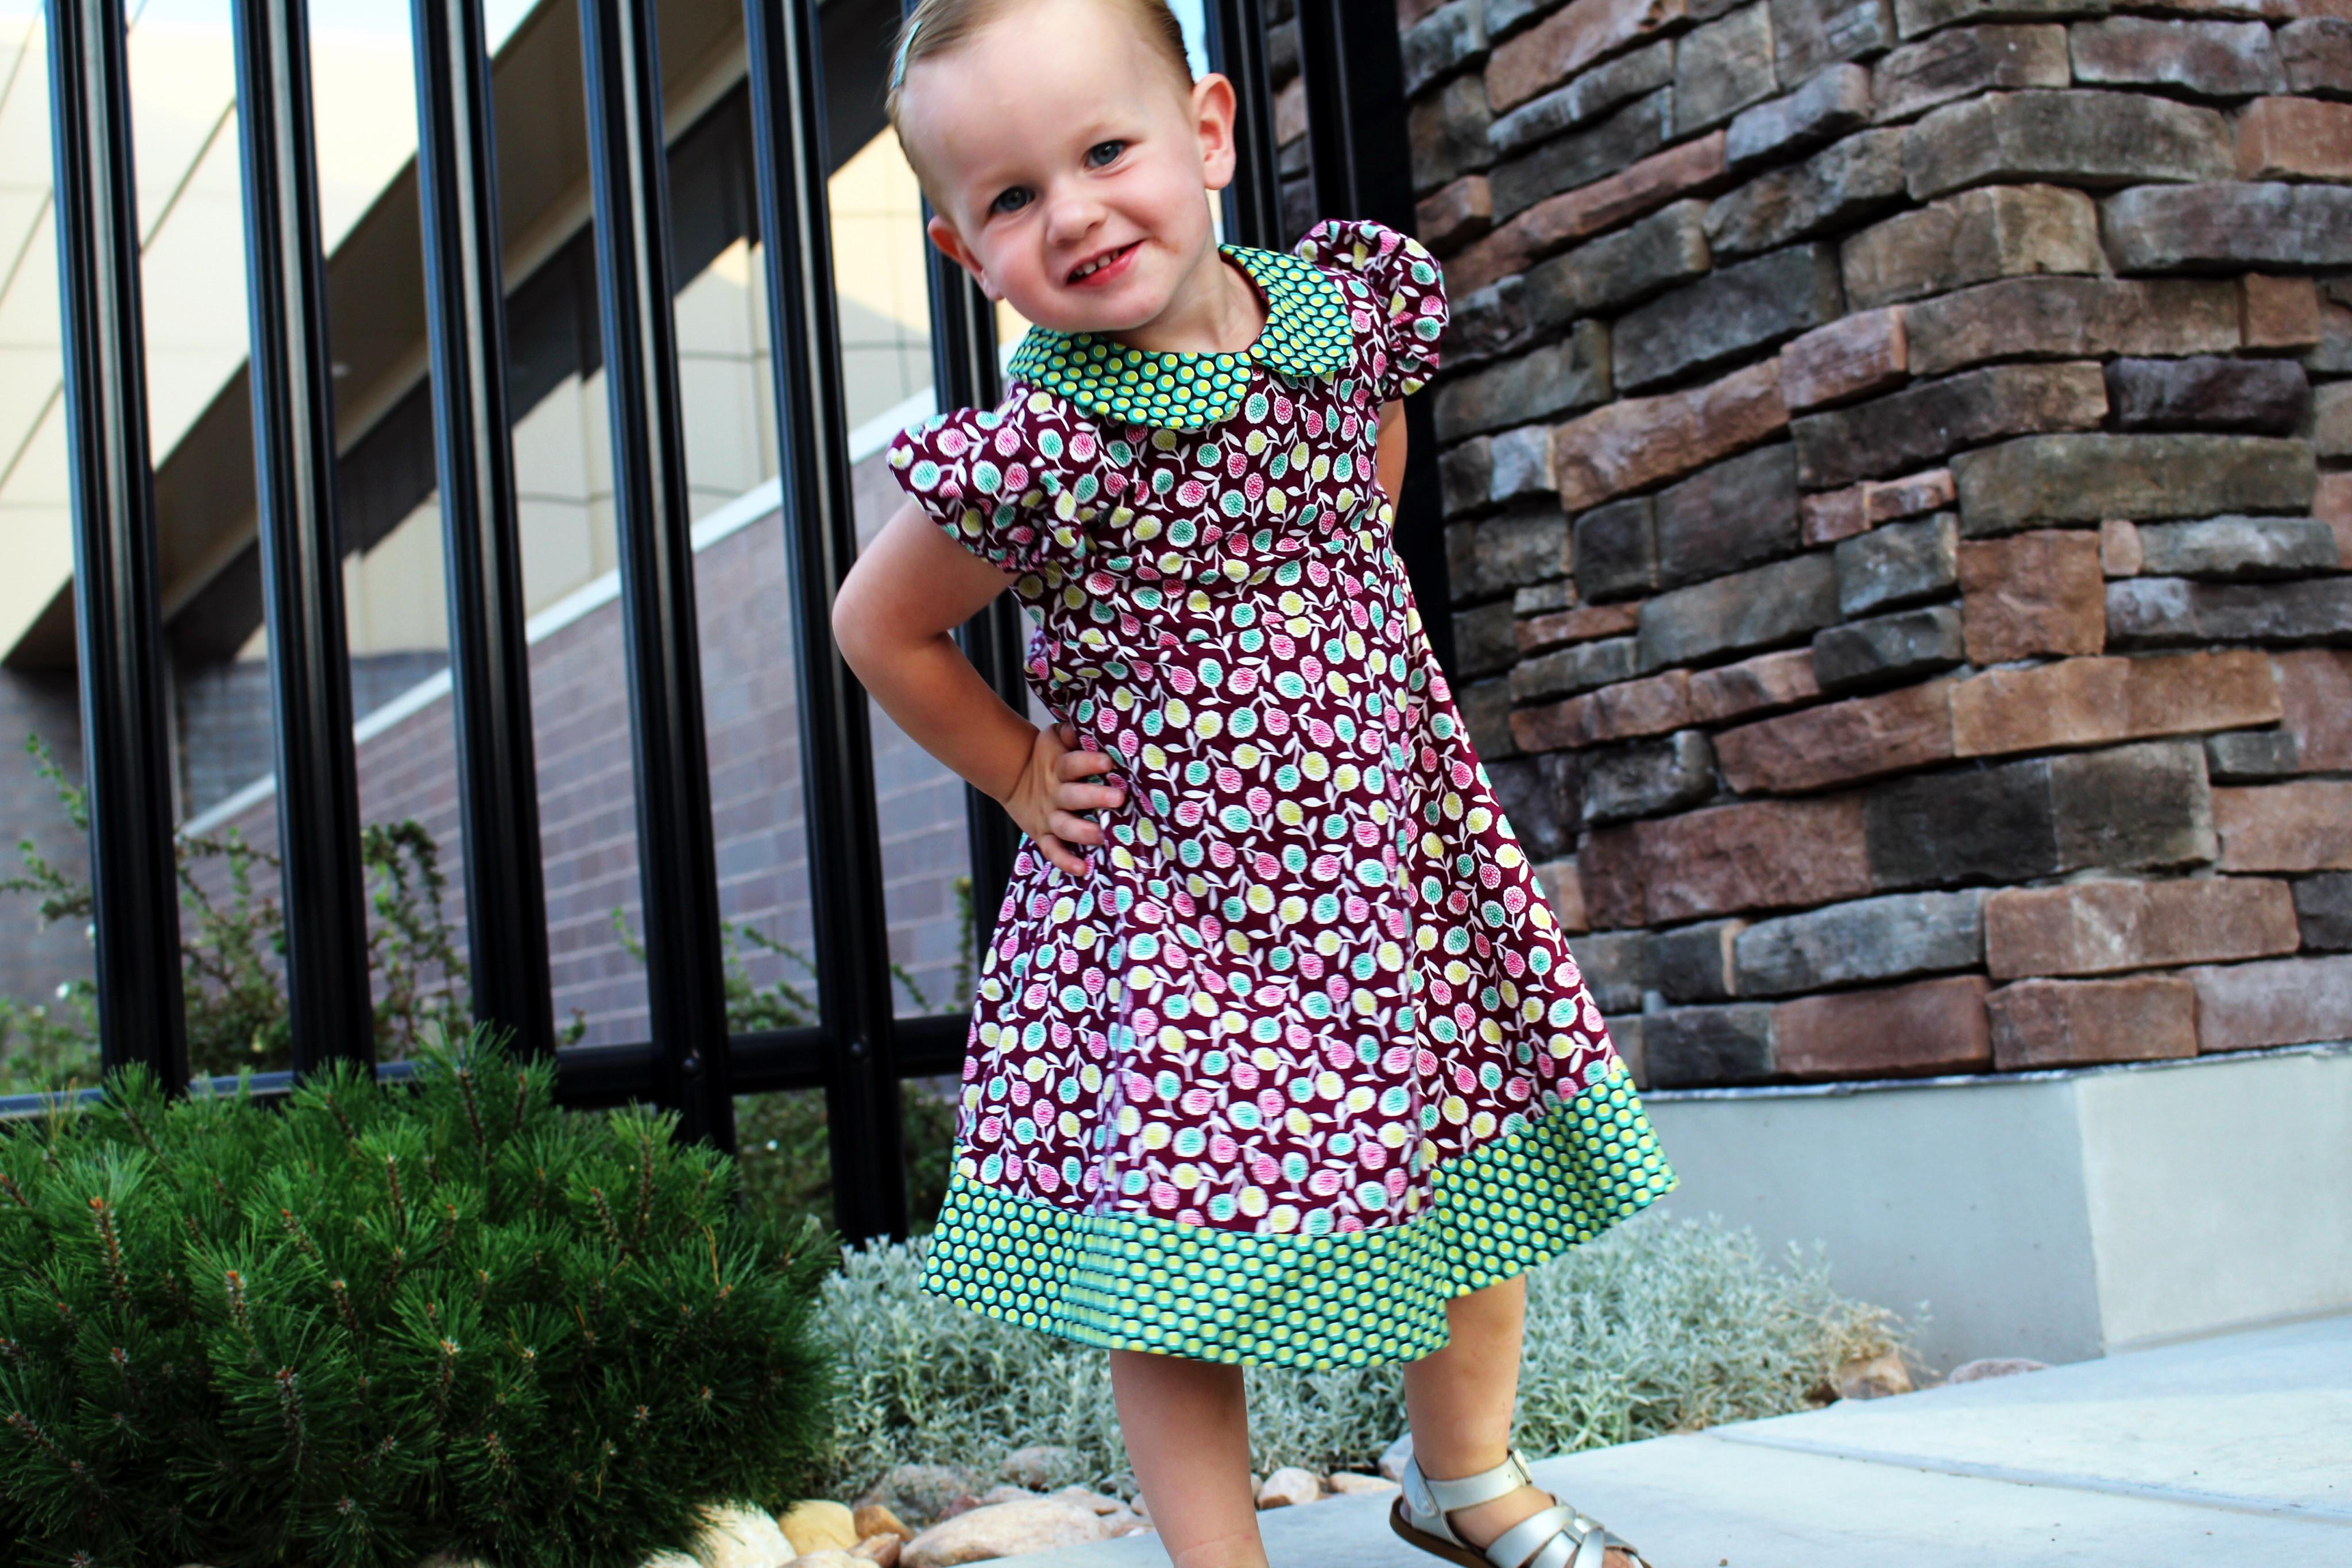 Best ideas about DIY Toddler Dress . Save or Pin DIY Toddler Dress Now.